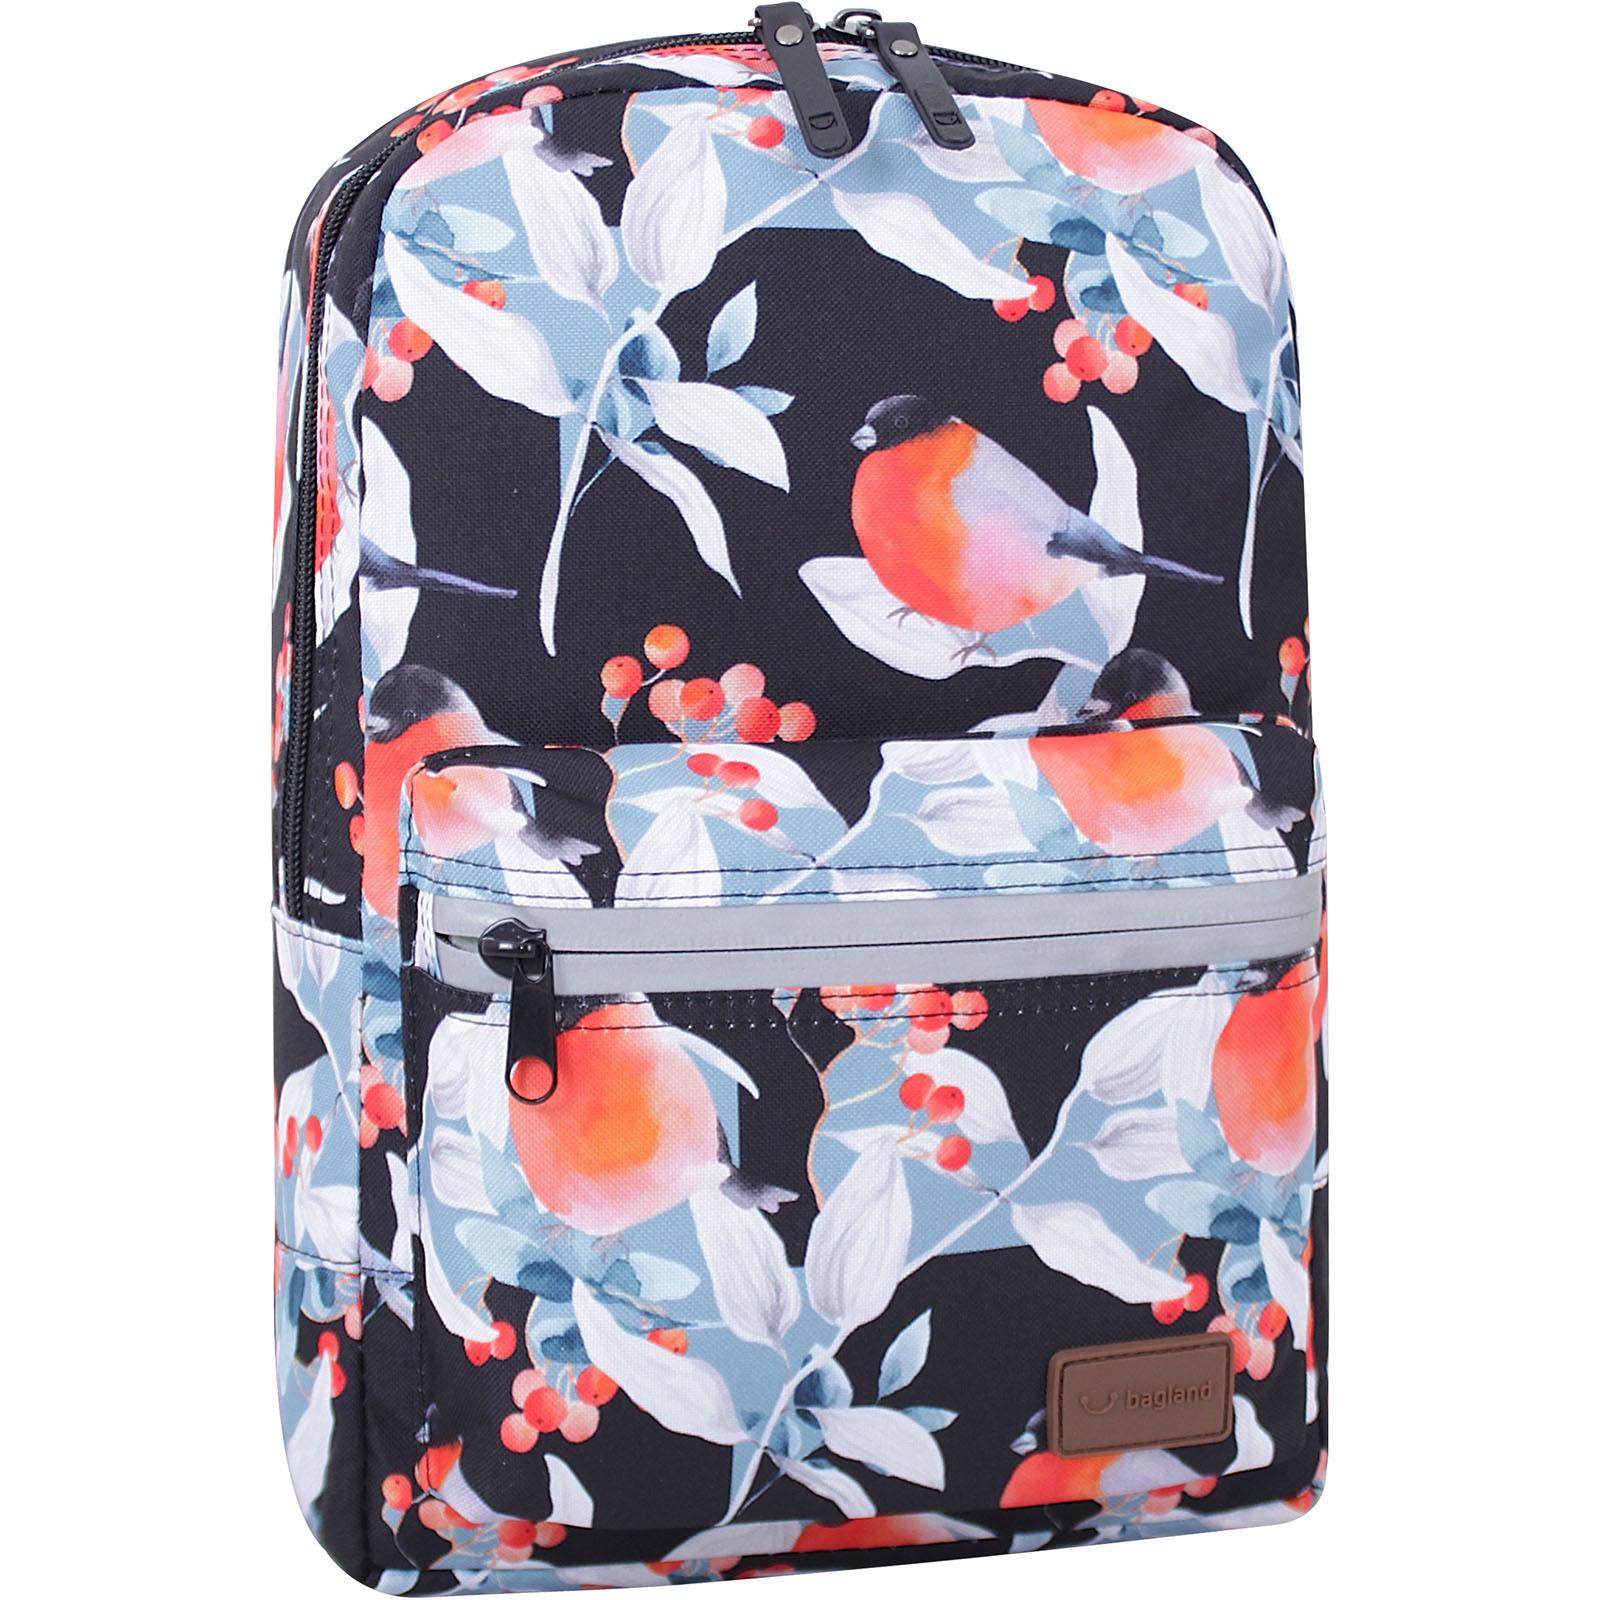 Молодежные рюкзаки Рюкзак Bagland Молодежный mini 8 л. сублимация 738 (00508664) IMG_6876_суб.738_.JPG